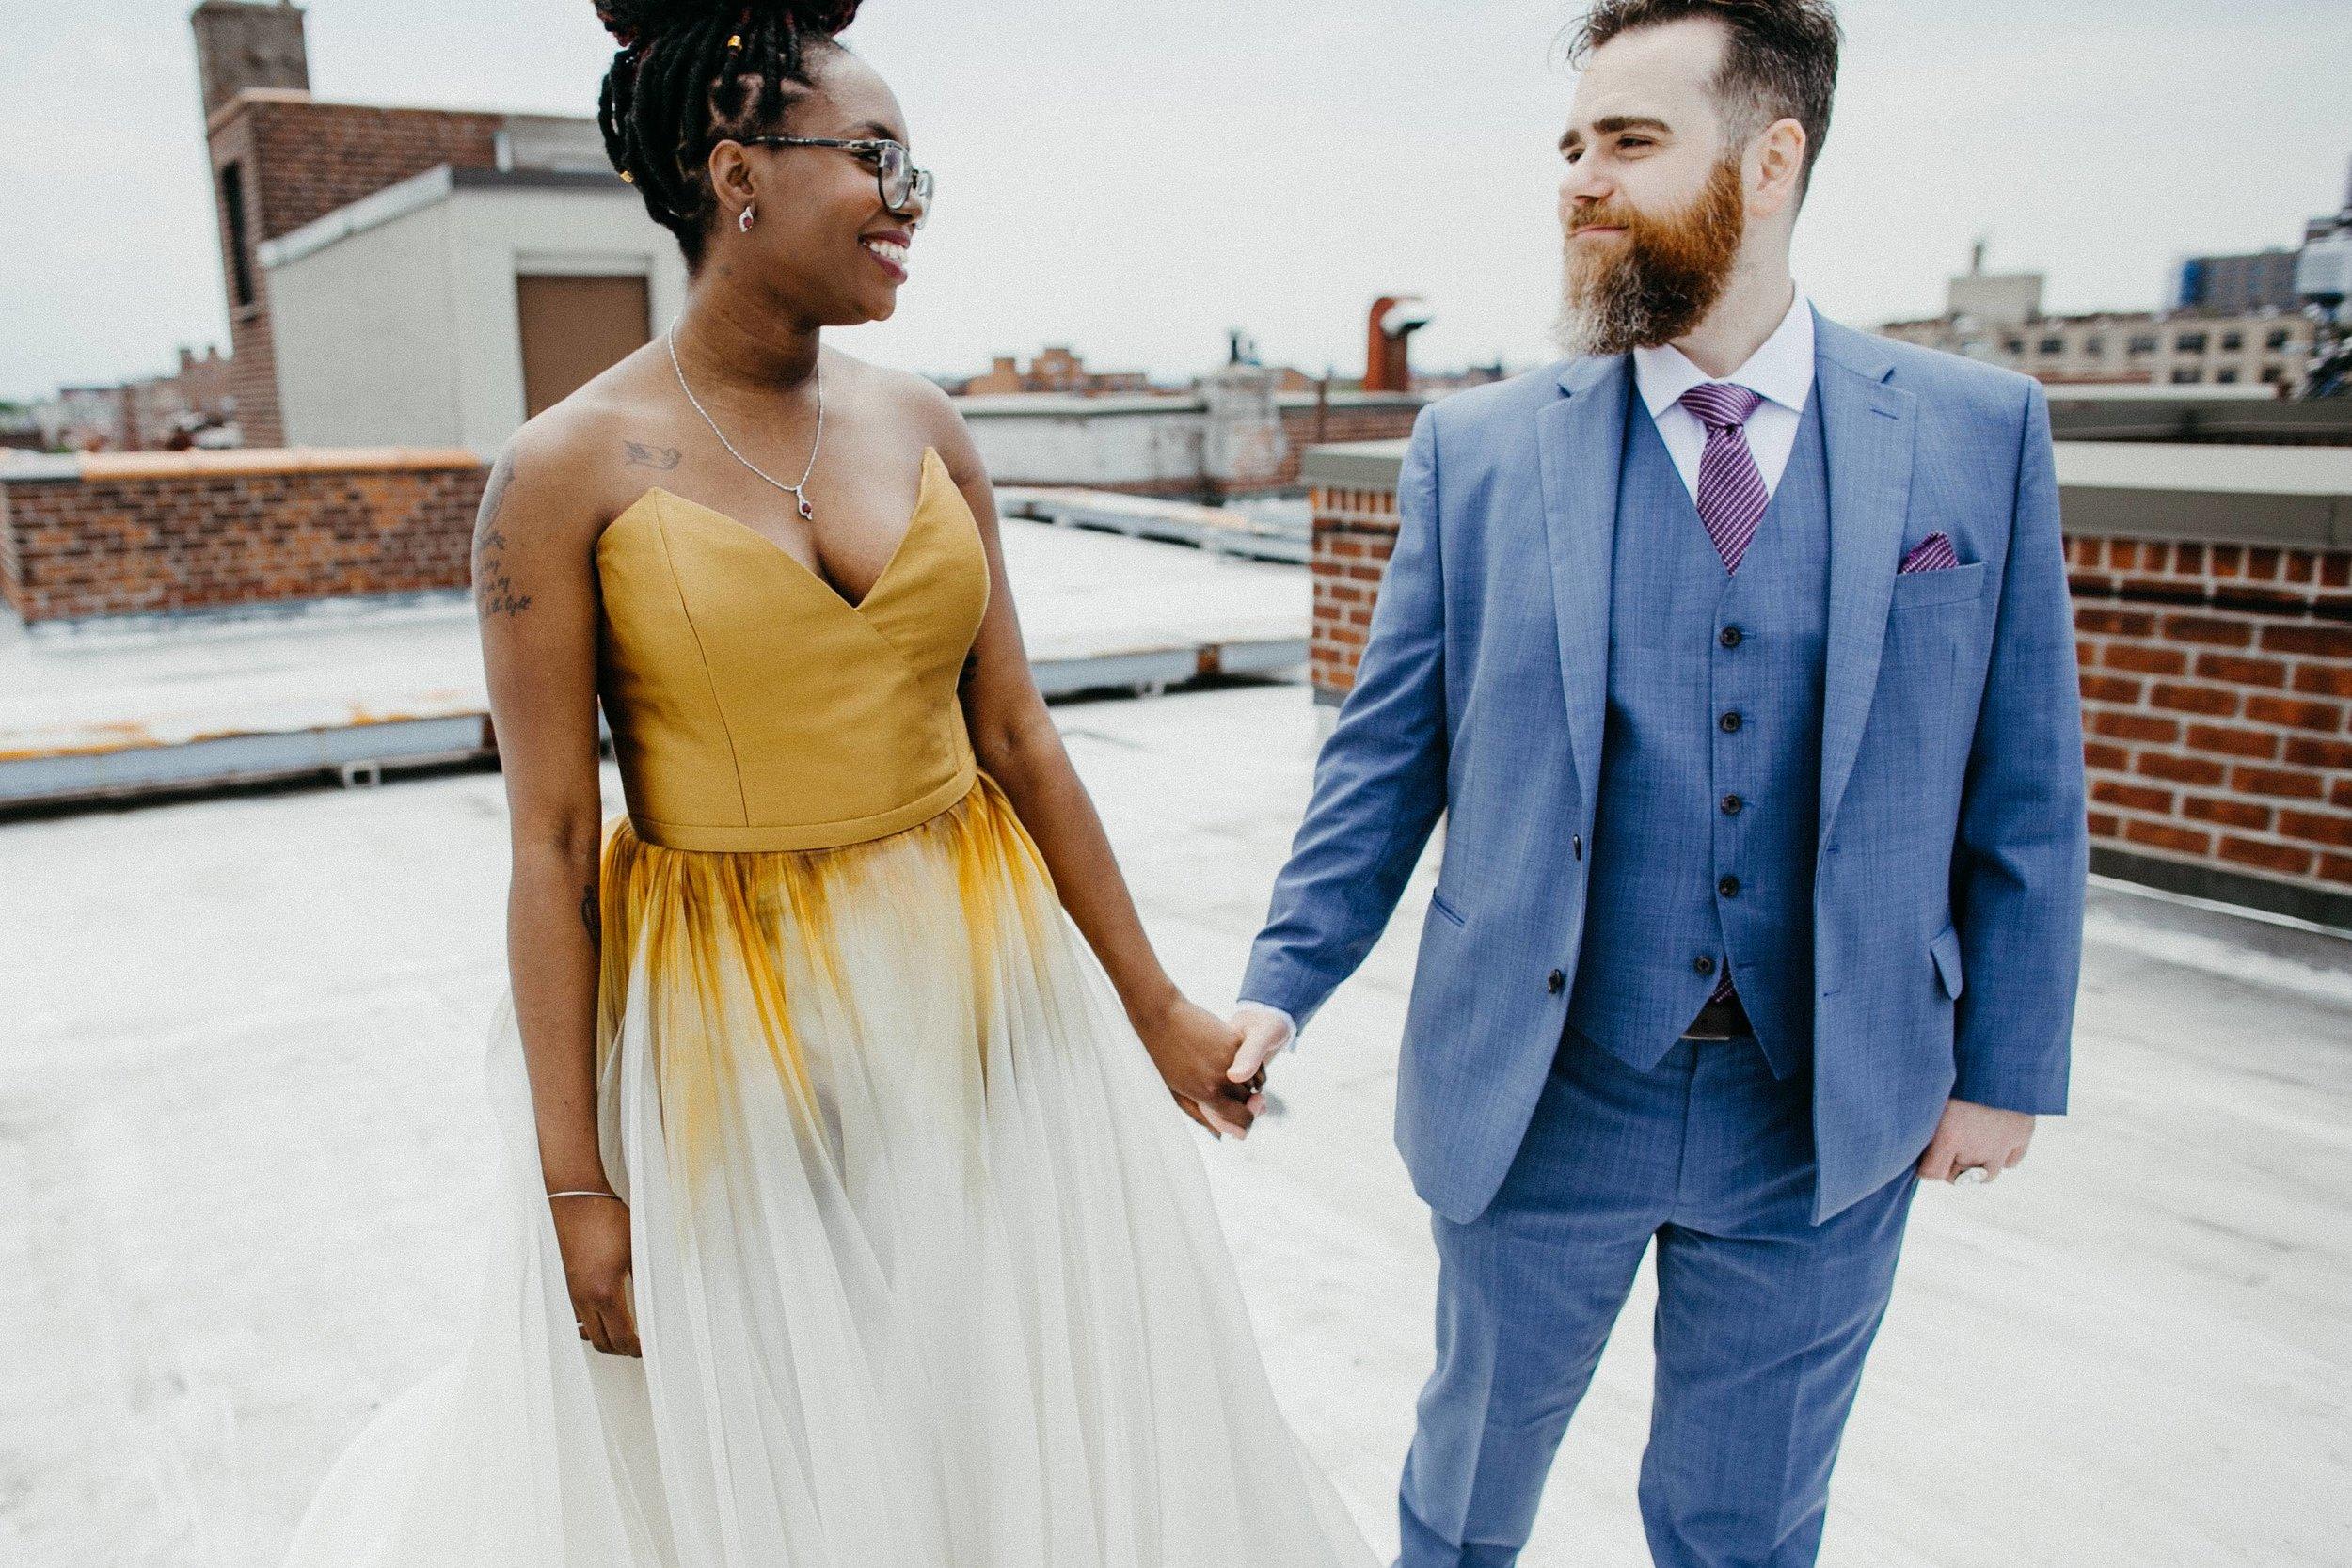 Sevlynn-Photography-Wedding-LIC-Landing-Maiella-NYC-10.jpg